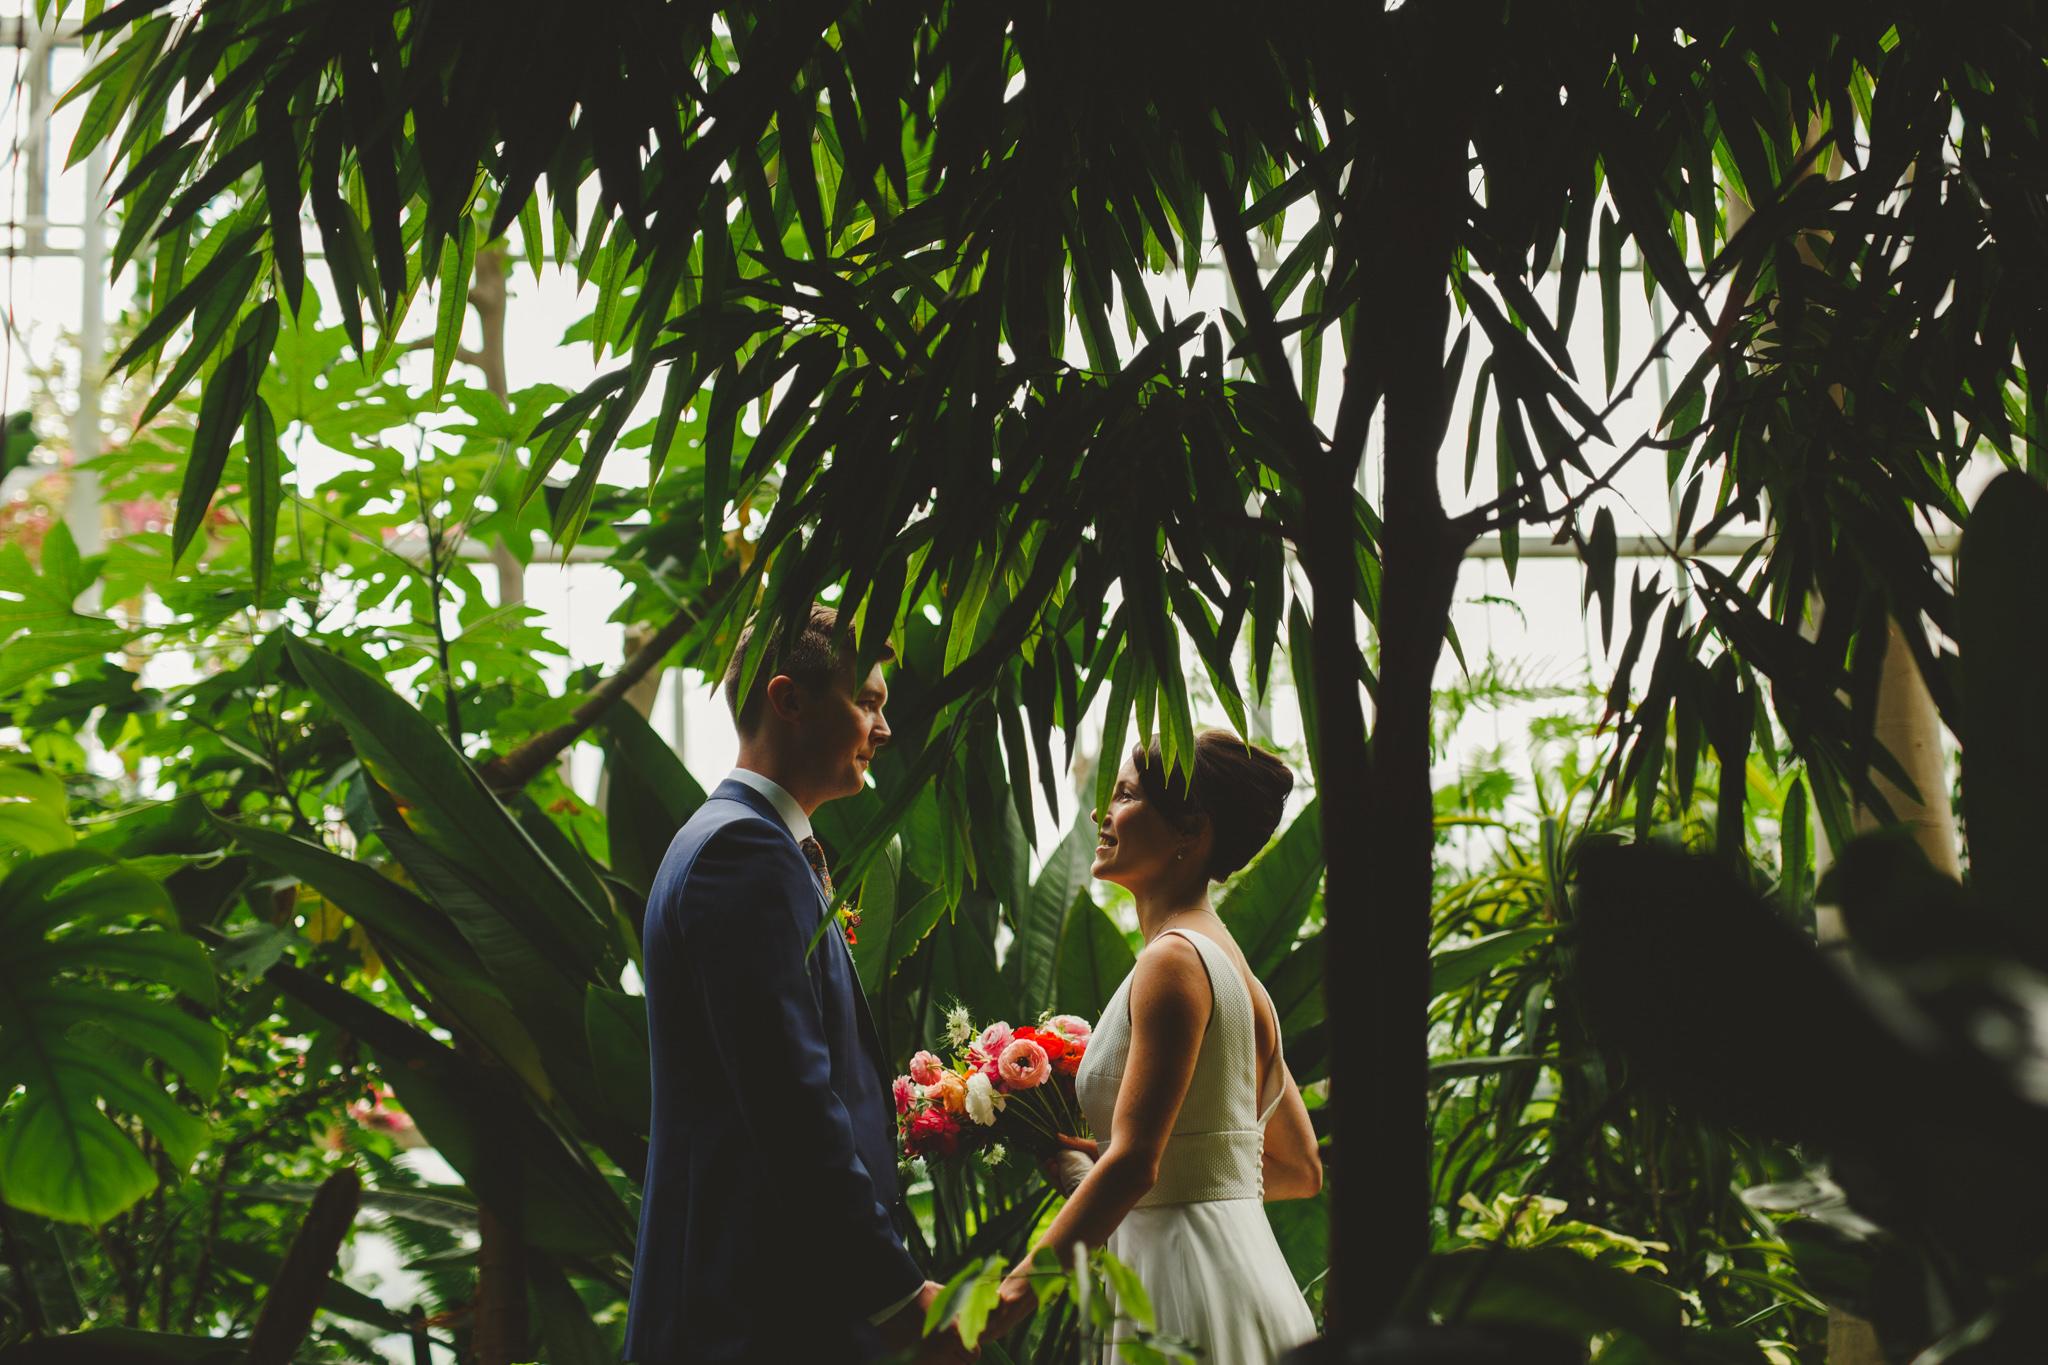 derbyshire-wedding-photographer-videographer-camera-hannah-30.jpg